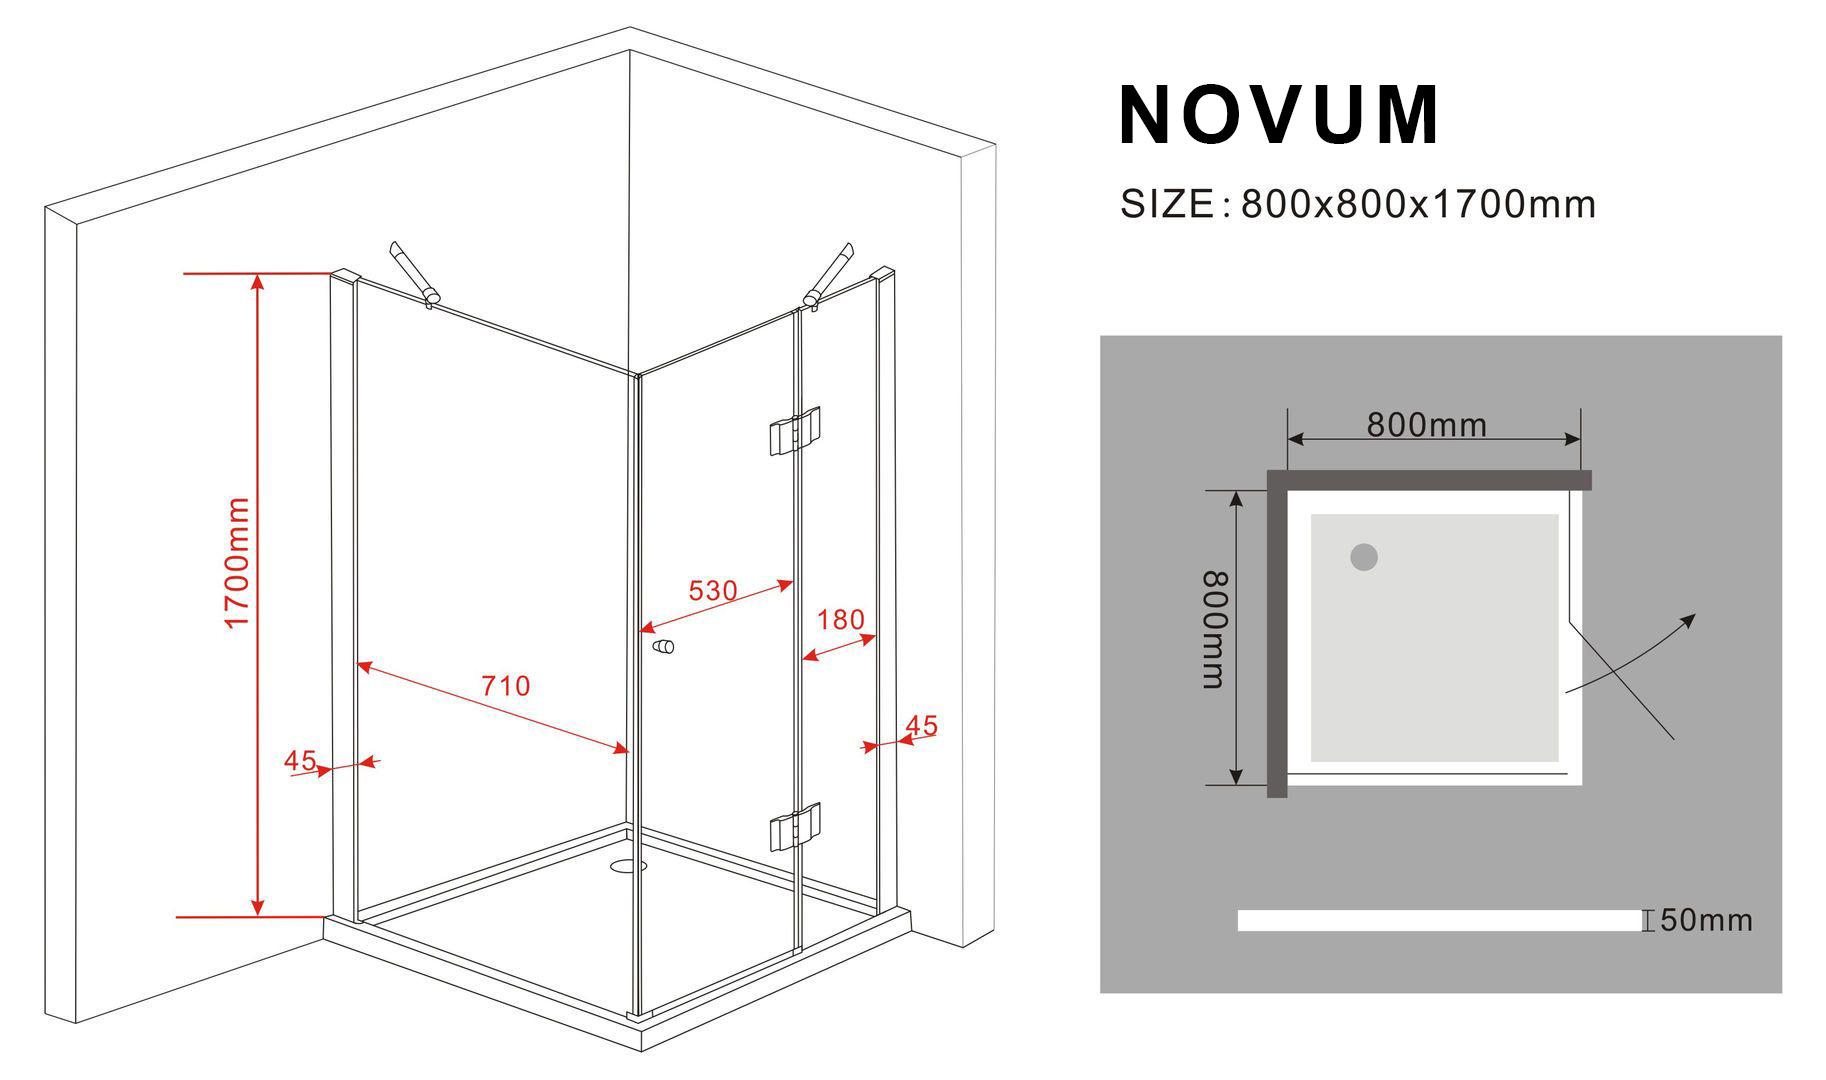 duschkabine novum 80 x 80 x 170 cm glasdeals. Black Bedroom Furniture Sets. Home Design Ideas